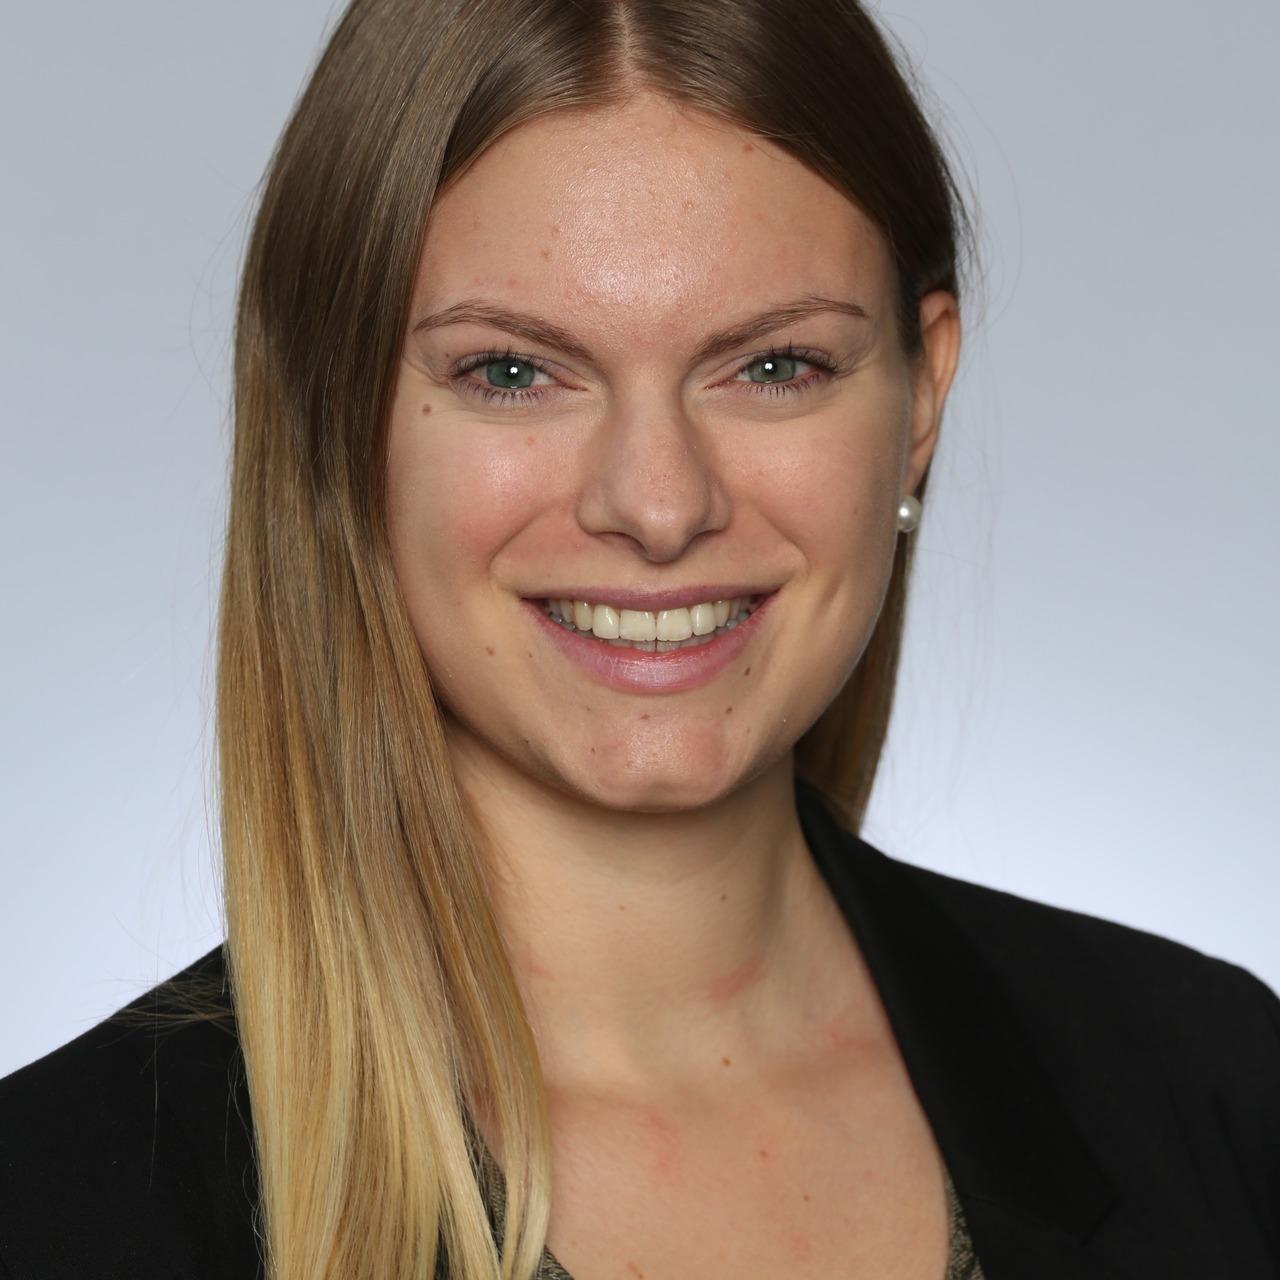 Bianca Helbig